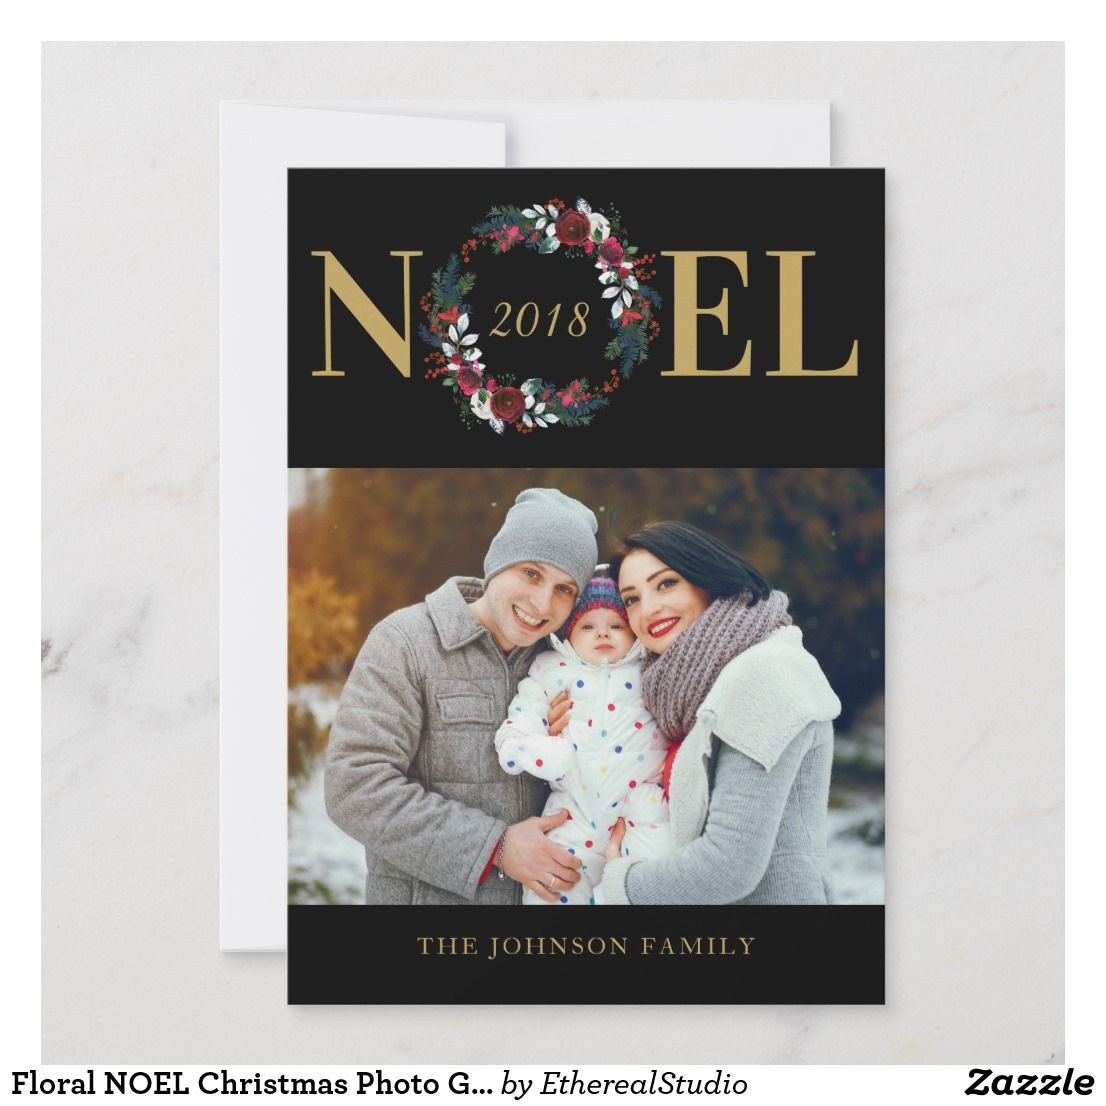 Floral Noel Christmas Photo Greeting Card Zazzle Com Christmas Photo Greeting Cards Holiday Design Card Christmas Photos